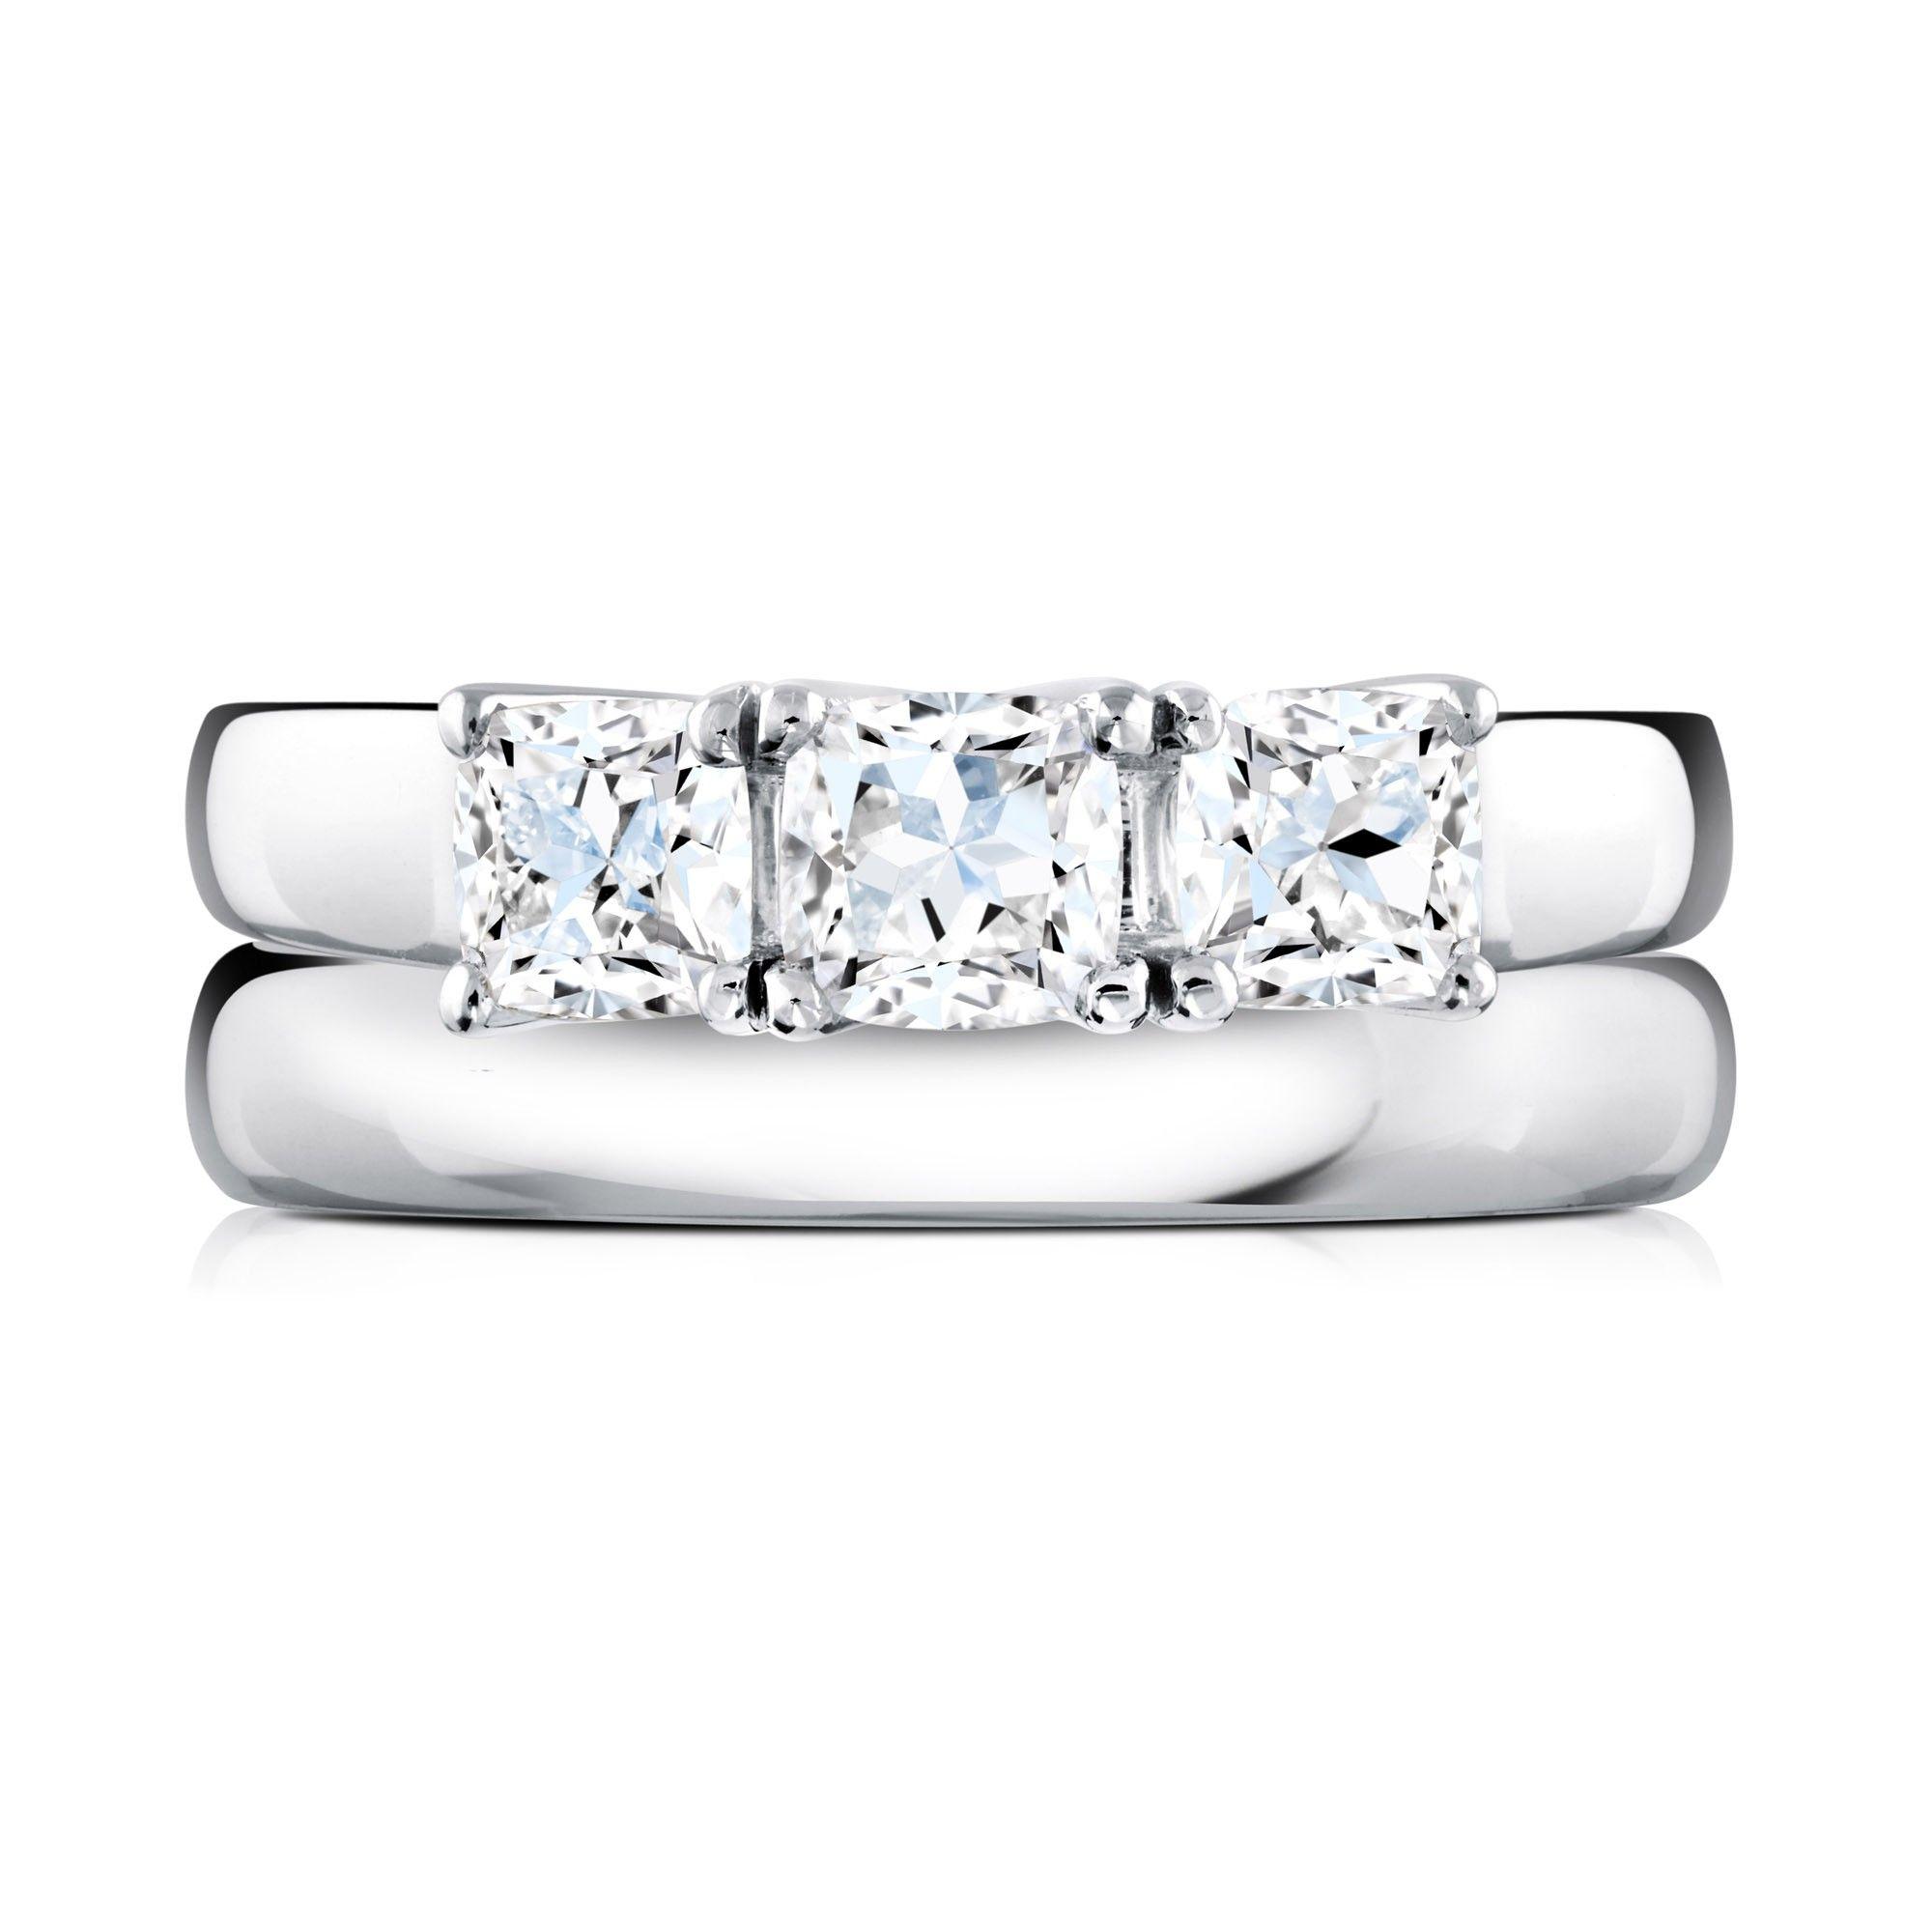 Burks 3 stone diamond ring Canadian diamond engagement